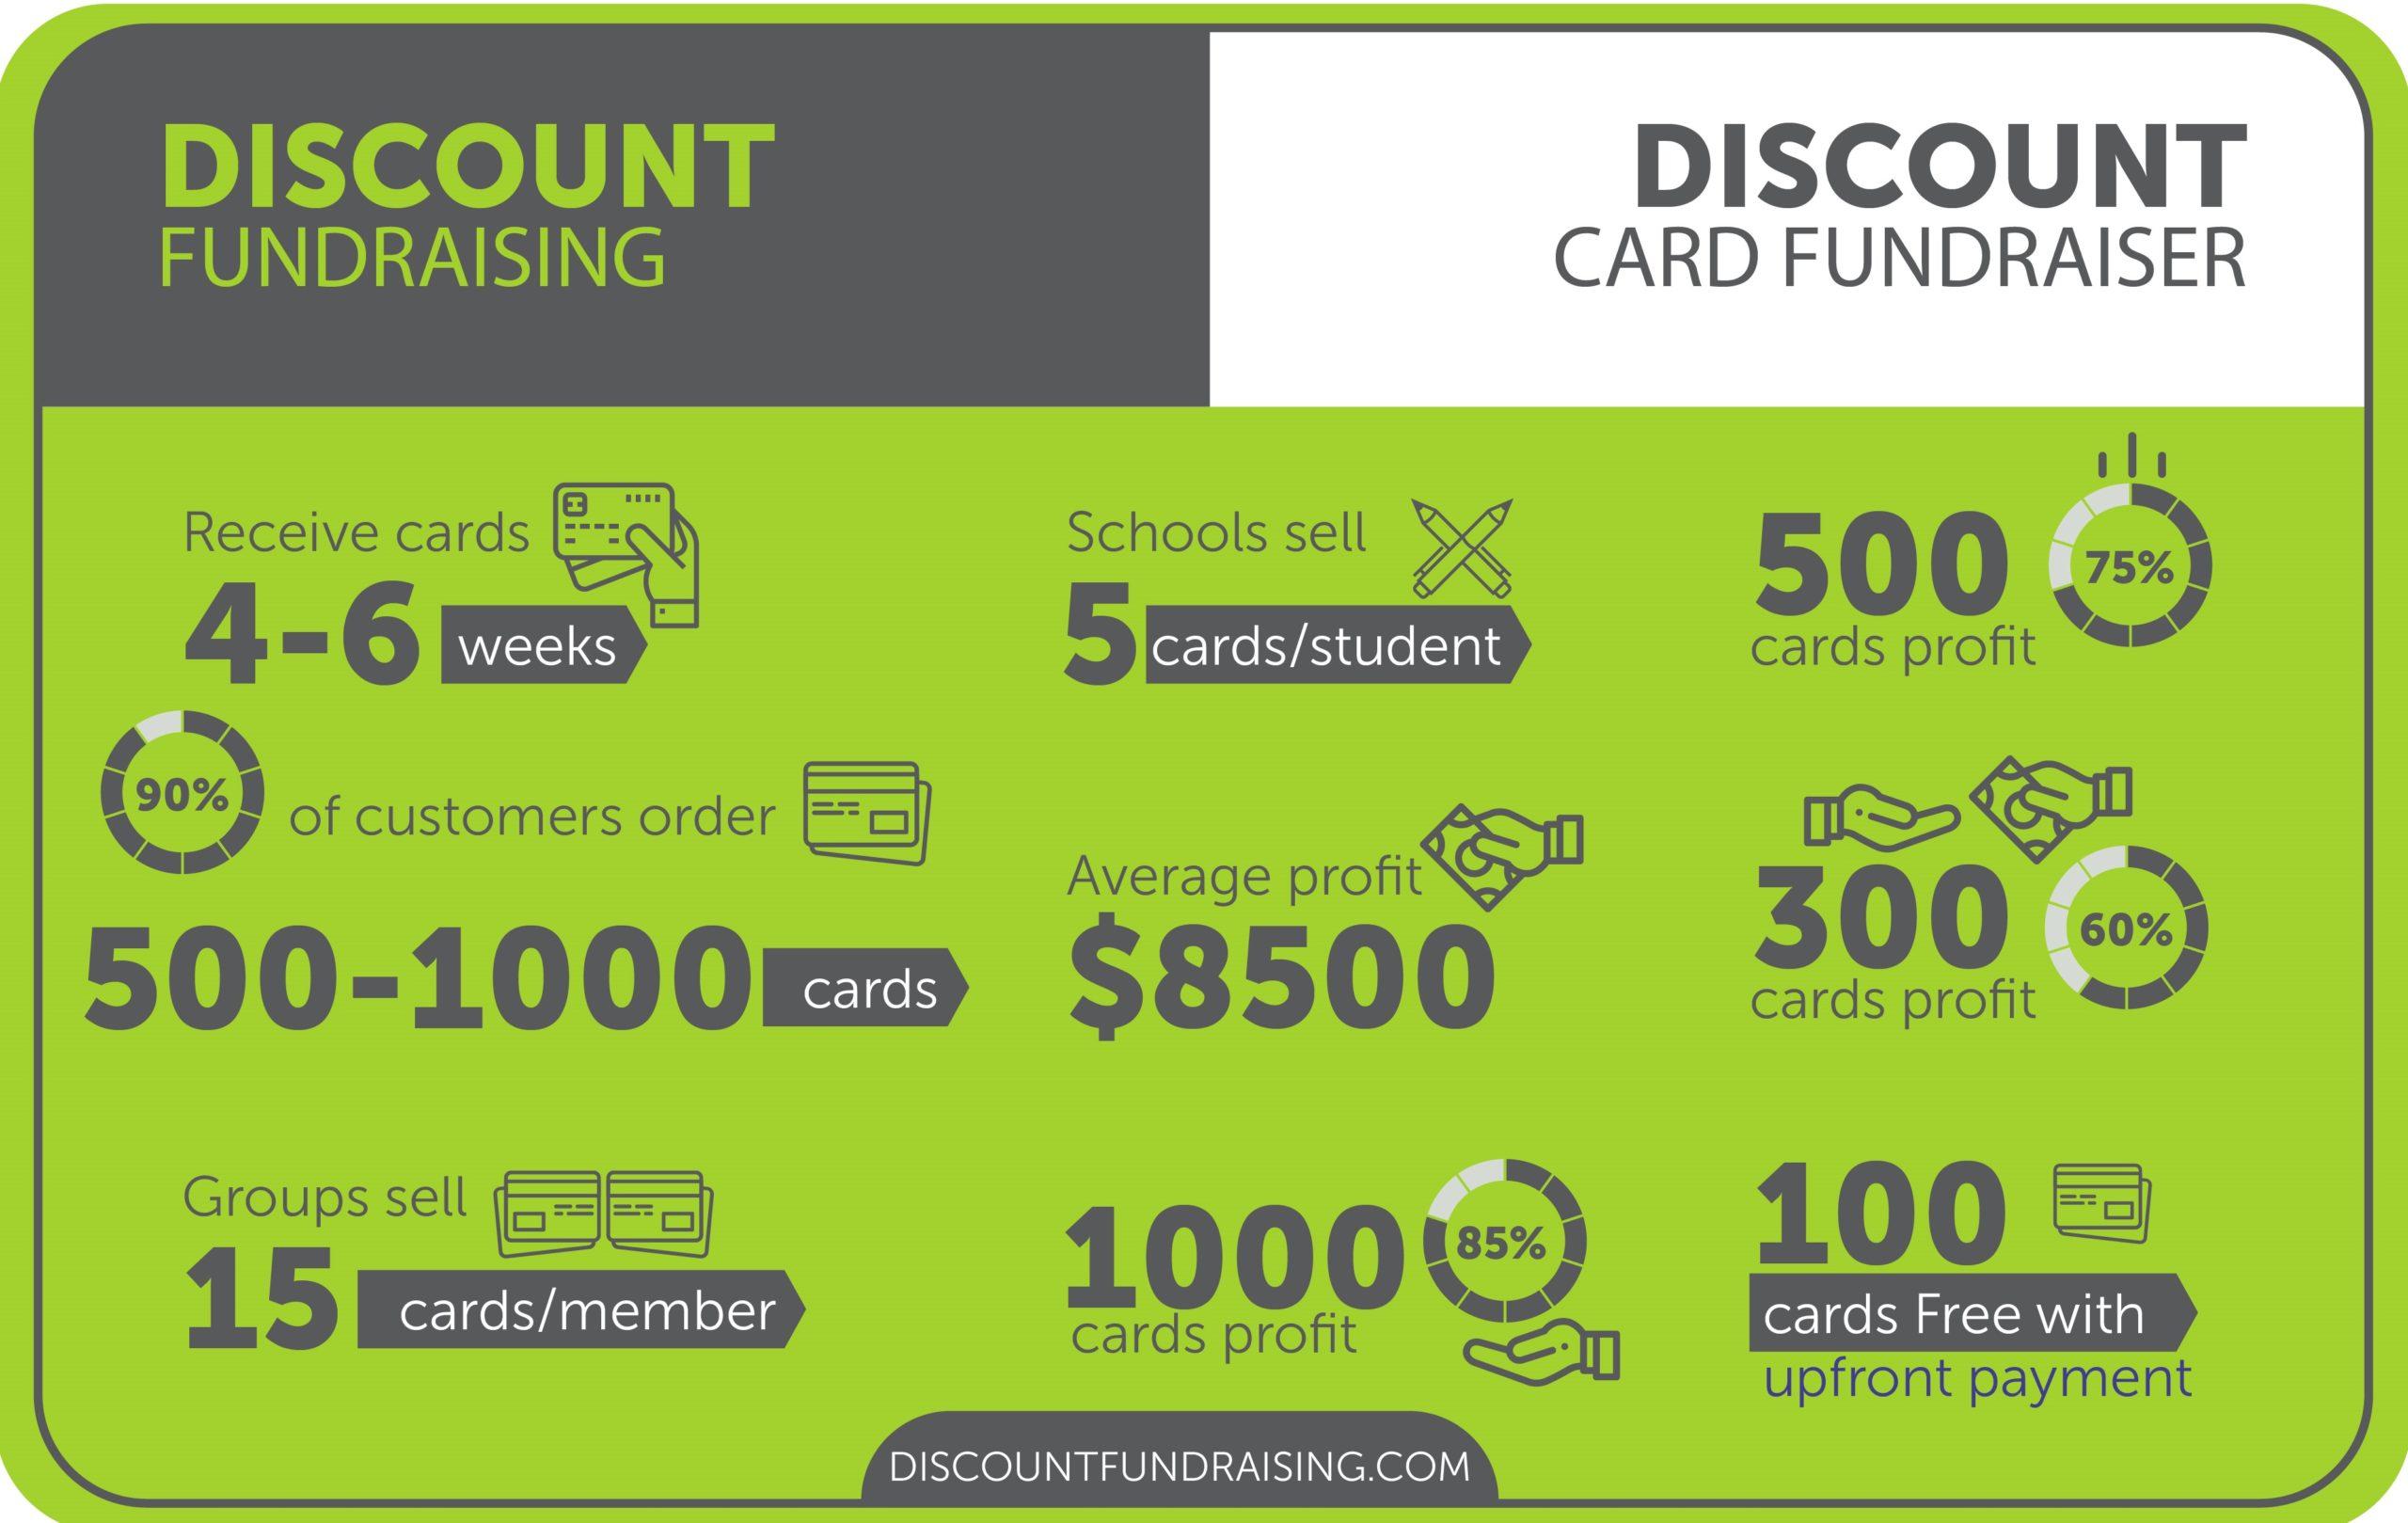 Discount Cards profit